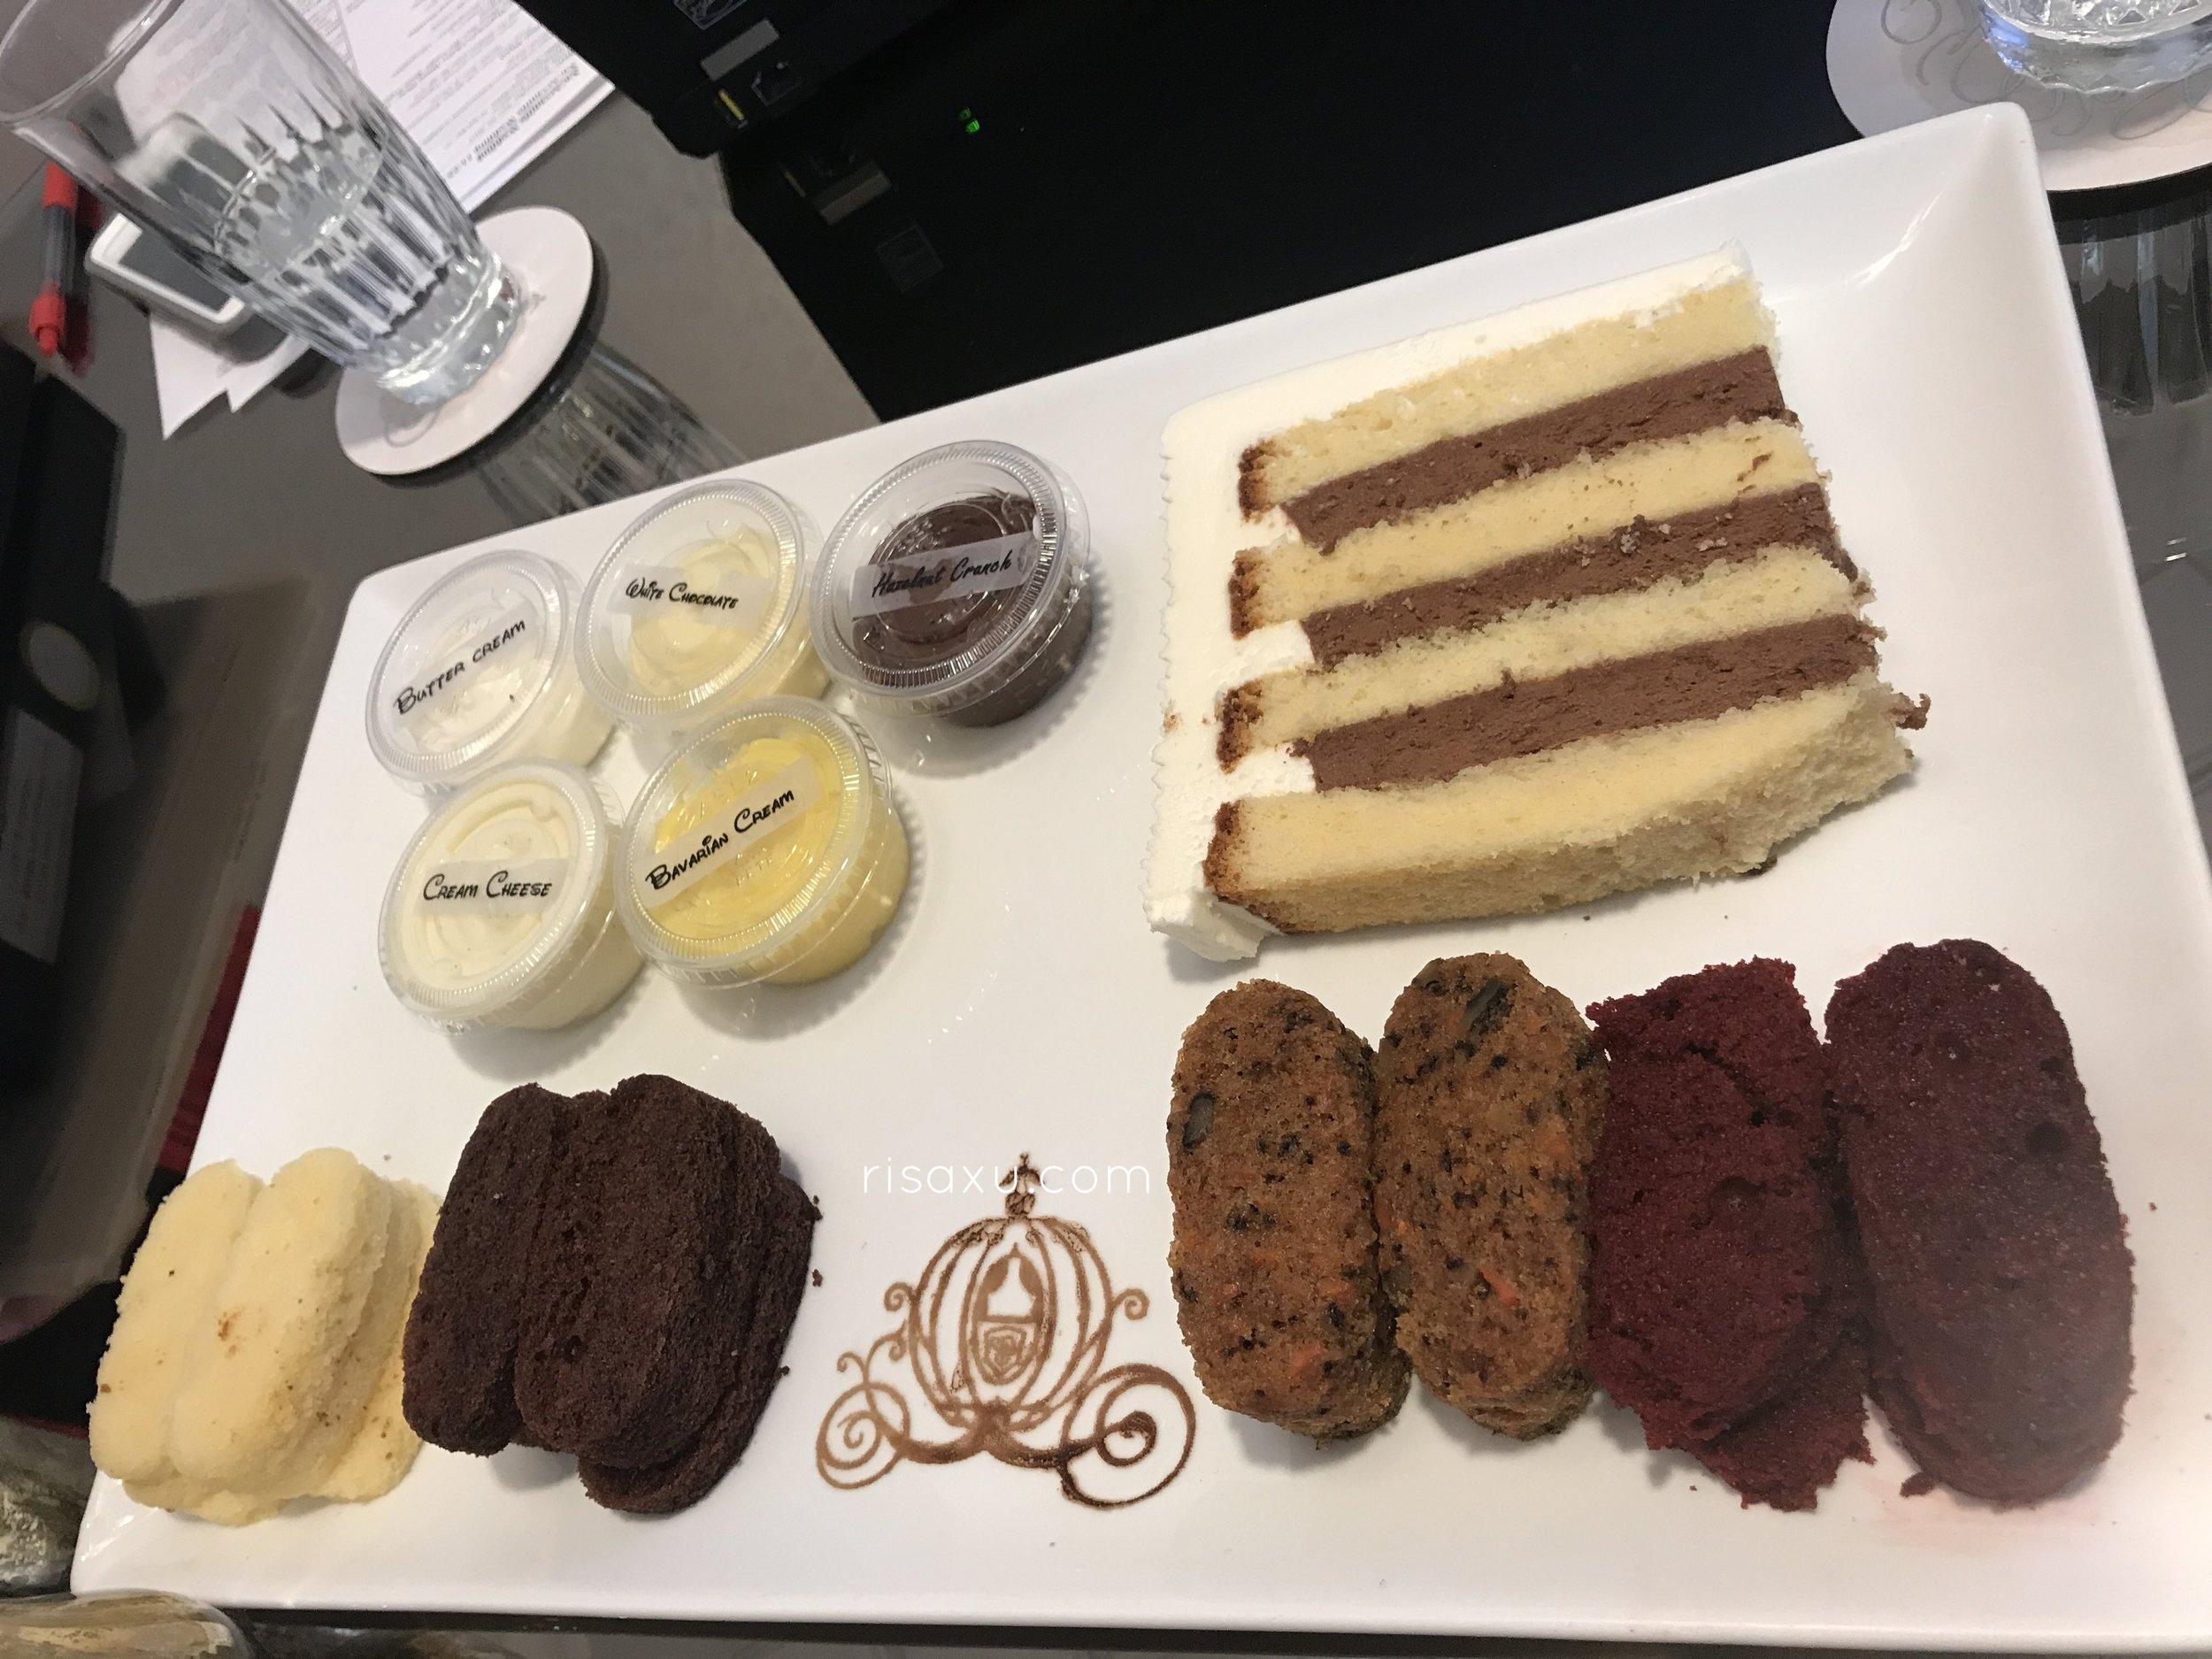 risa xu Disney wedding planning session cake tasting